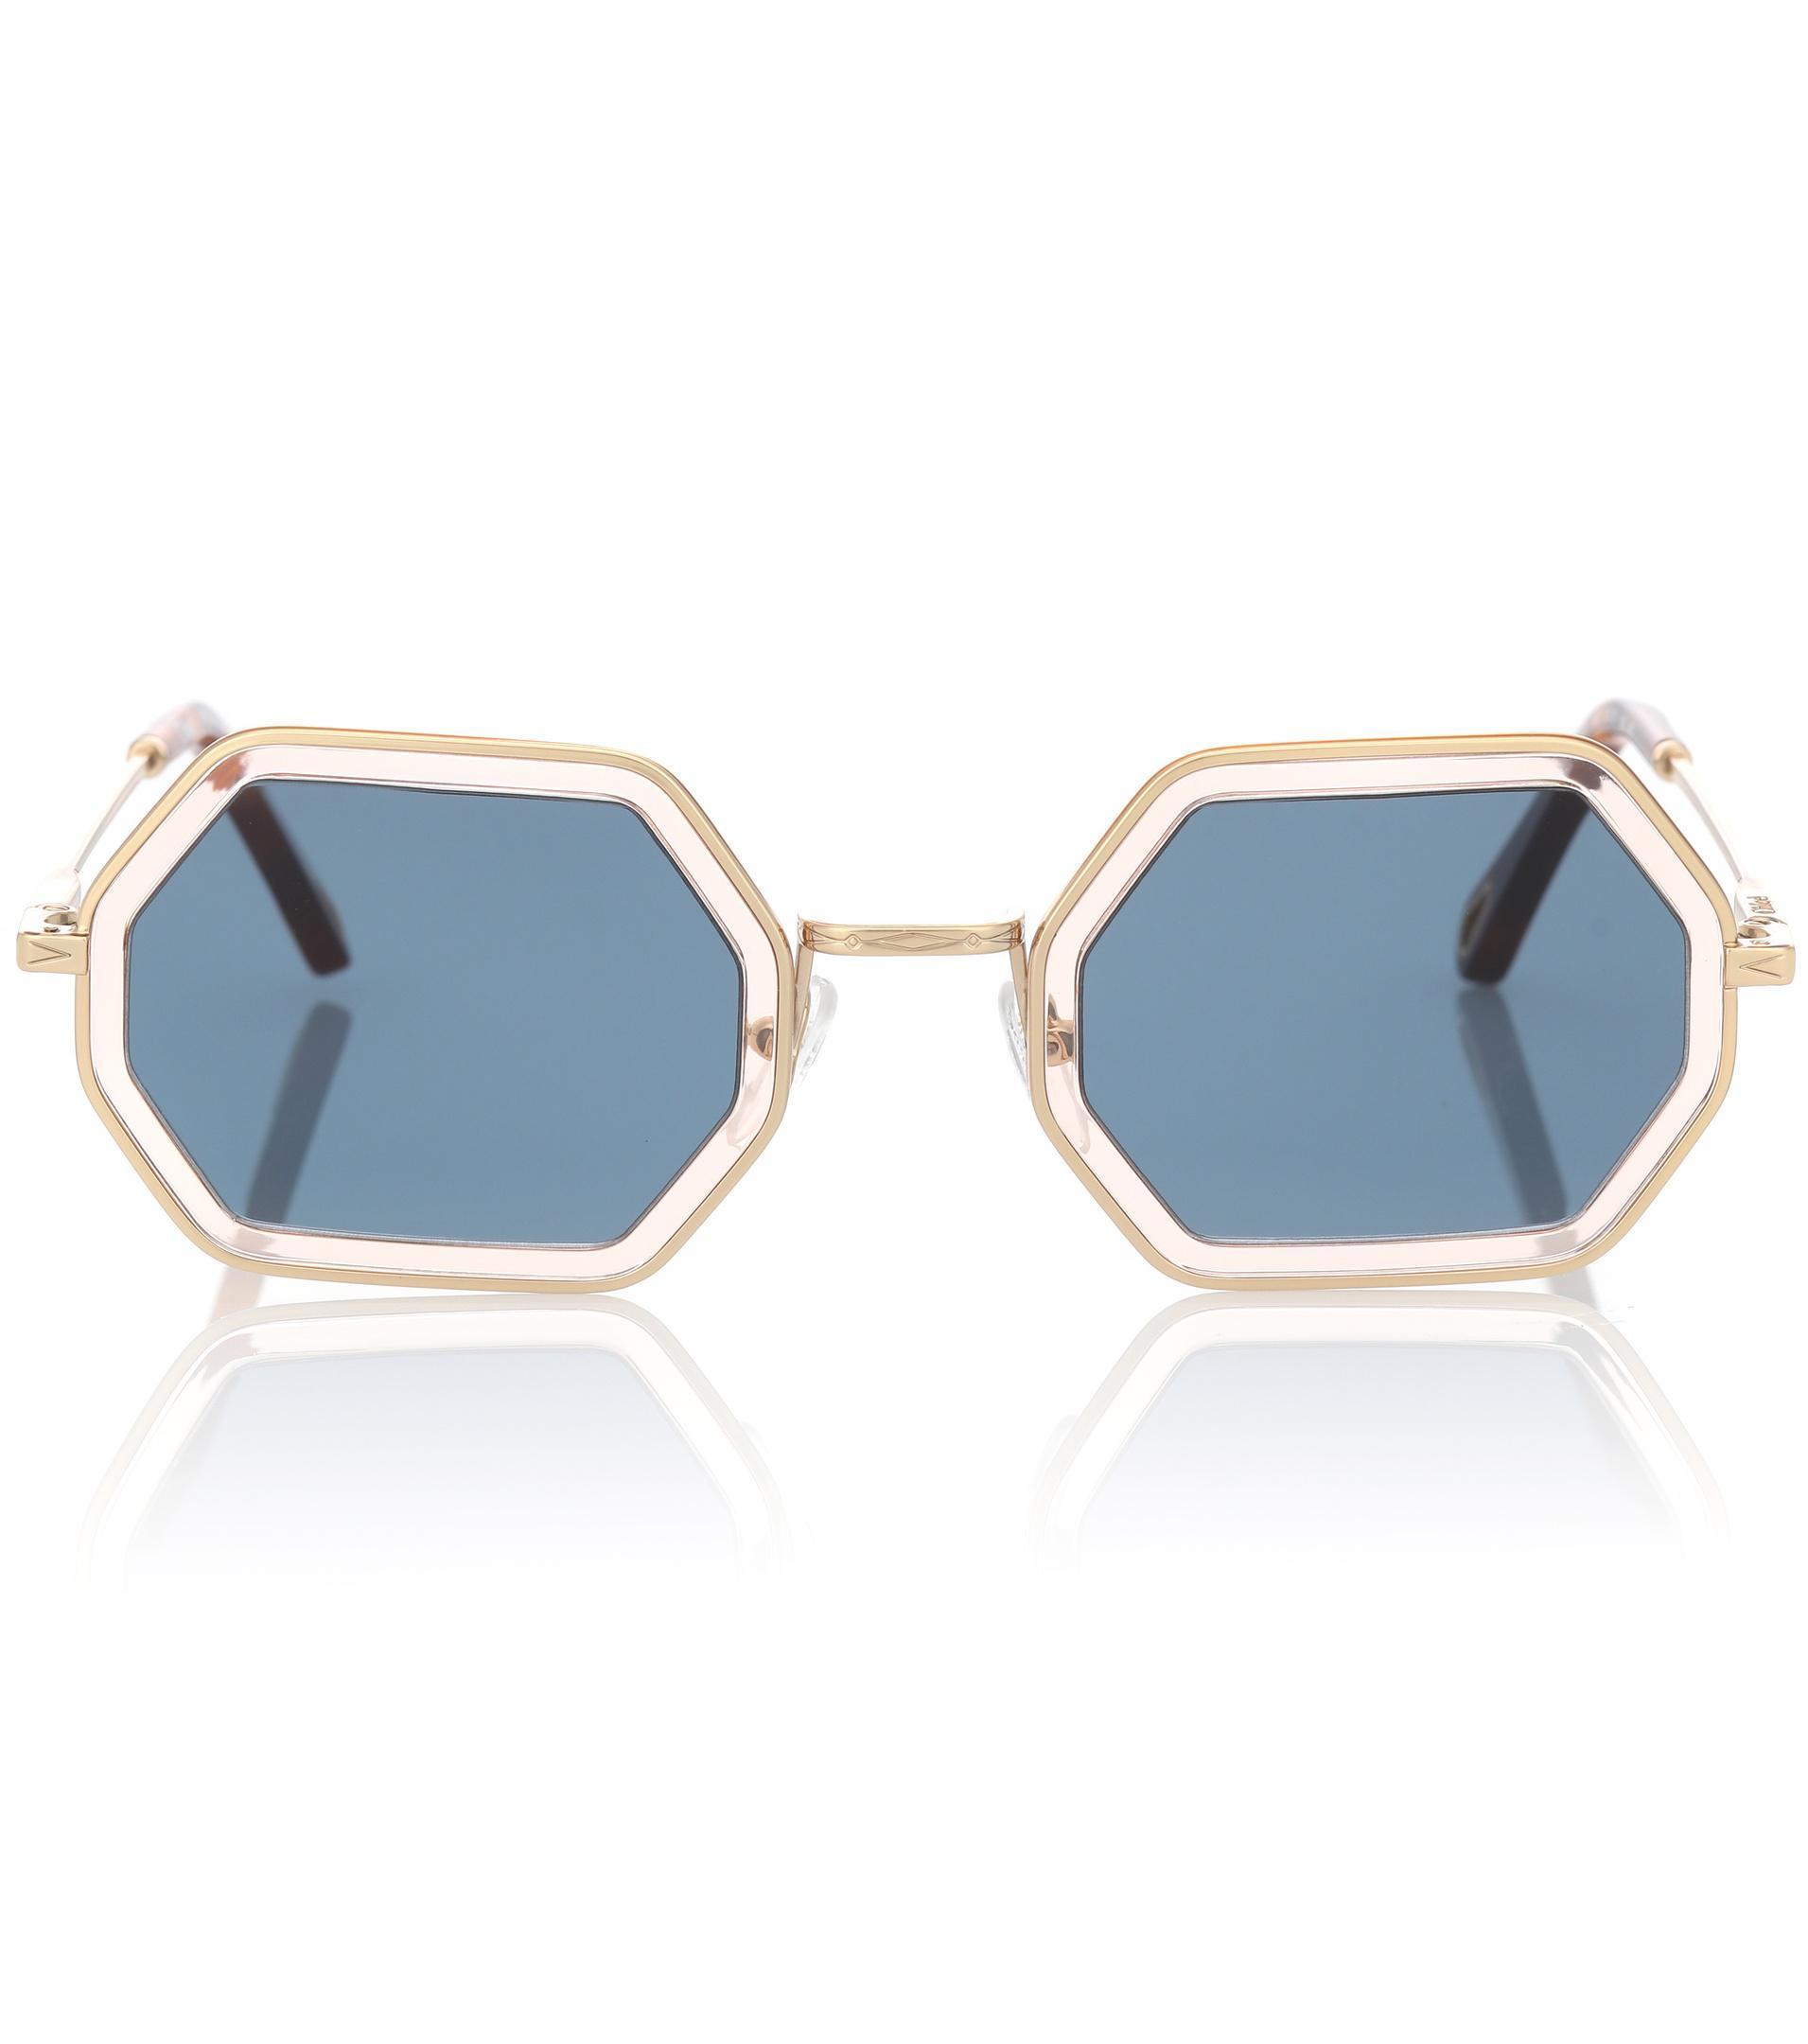 22afa6f12b5 Chloé Tally Sunglasses in Blue - Lyst